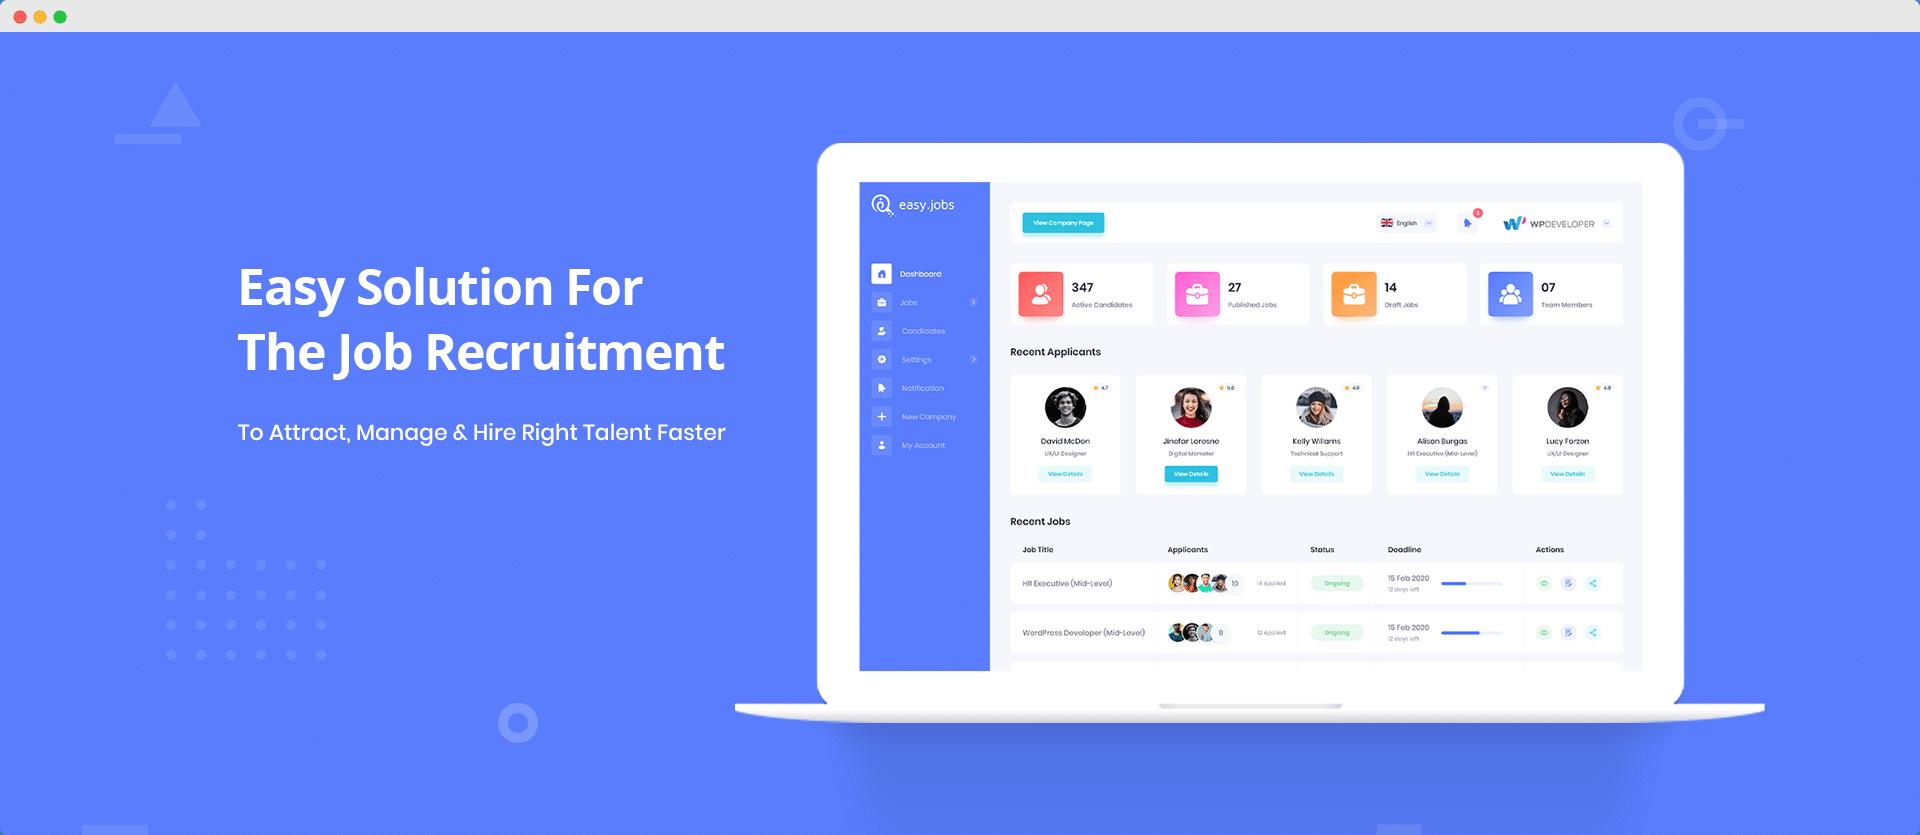 What's New In Easy.Jobs 2.0: Revamped UI, WordPress Plugin & More